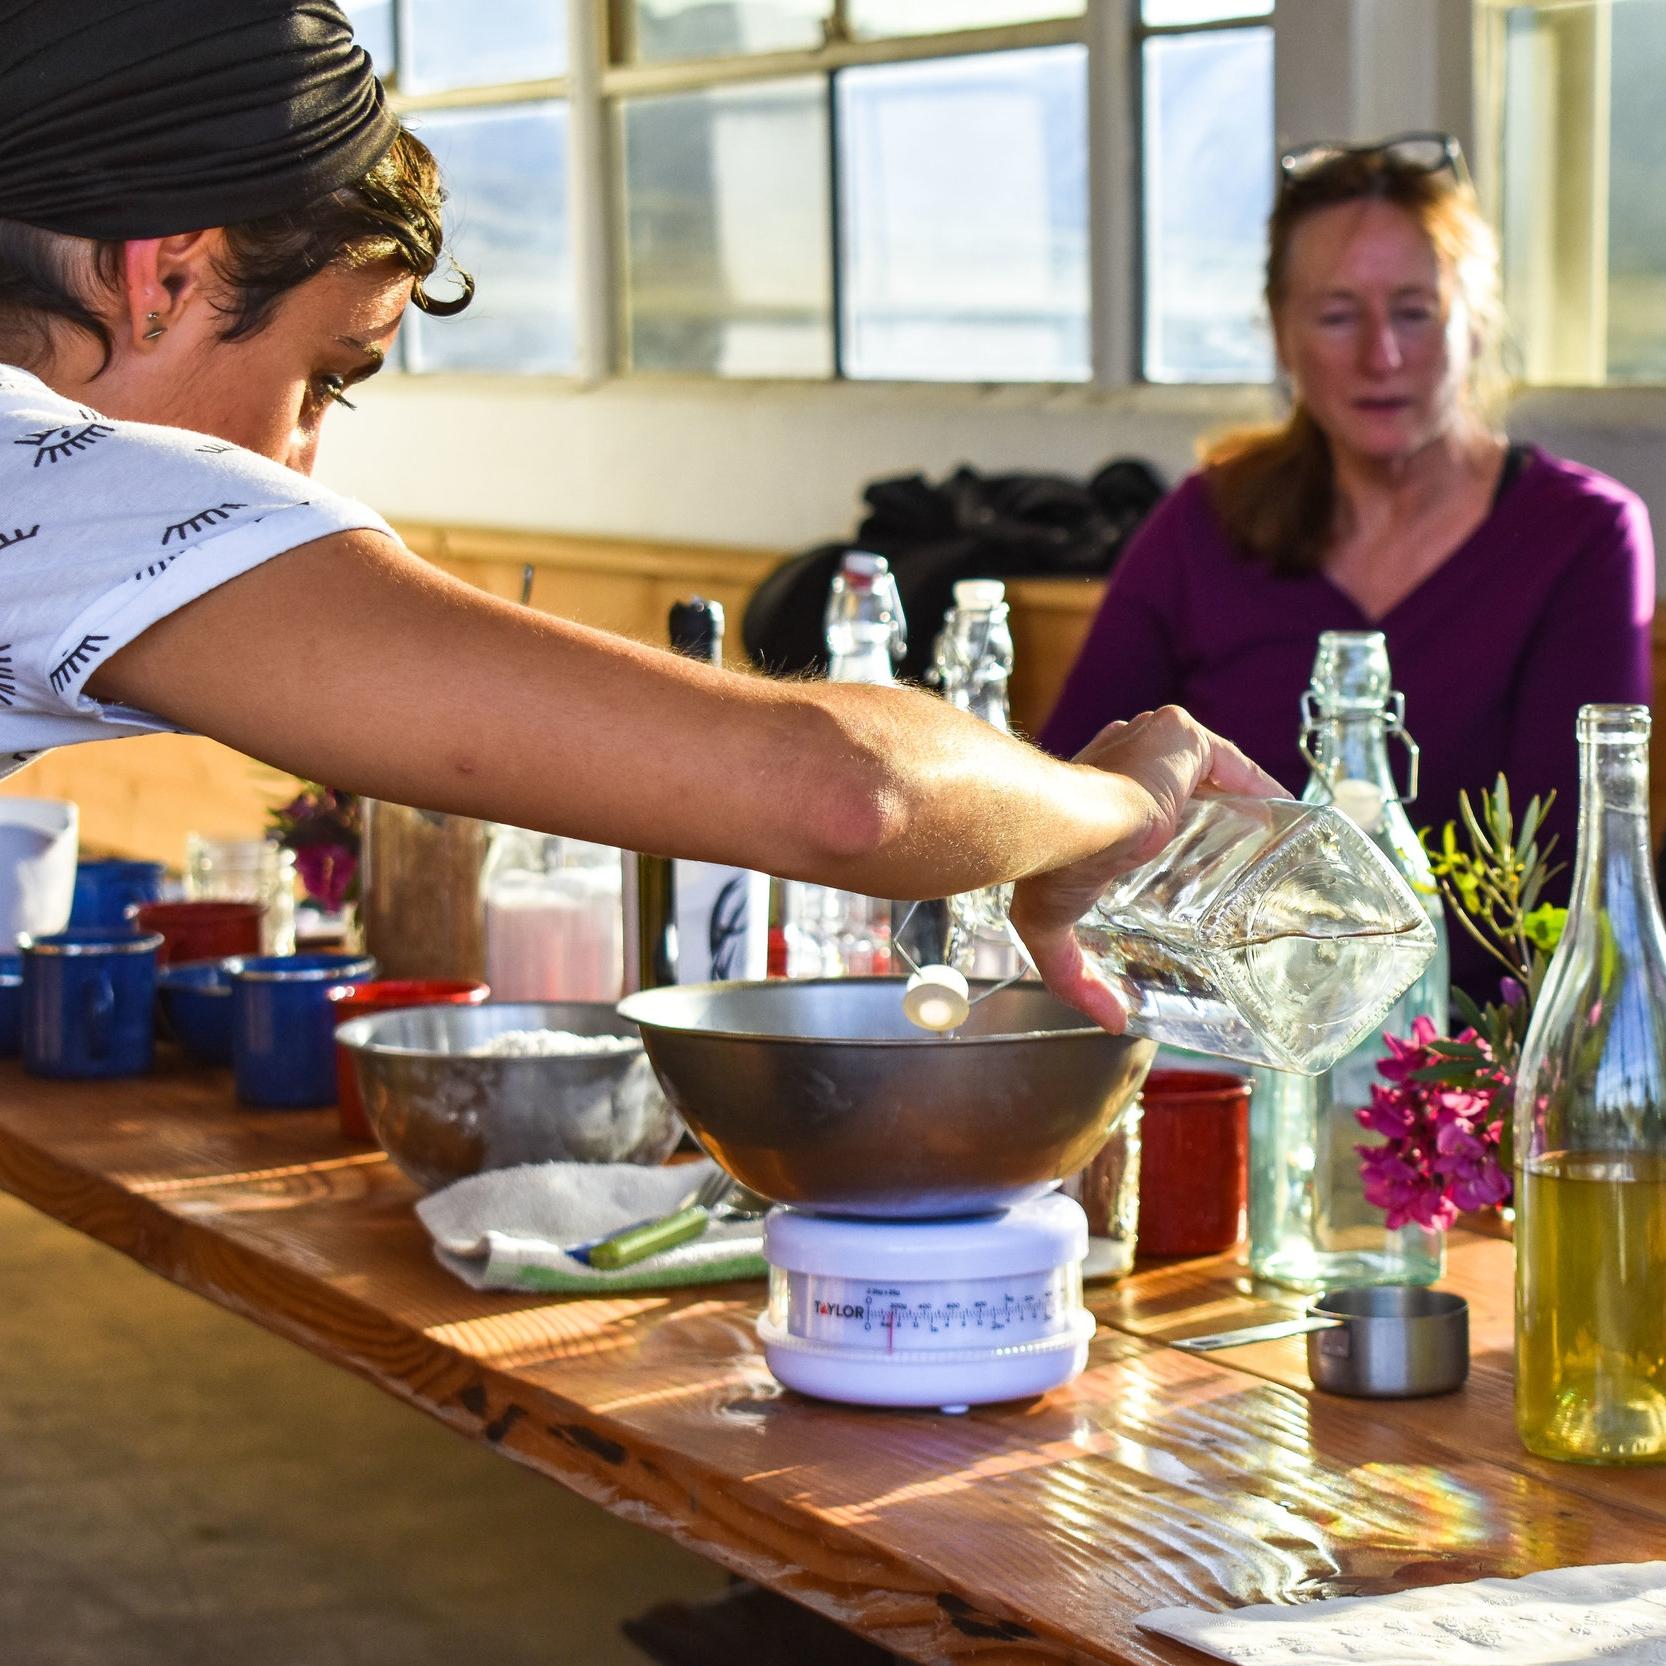 Grains are Good: Community Bread Workshop feat.  The Bread Companion  April 13, 2018